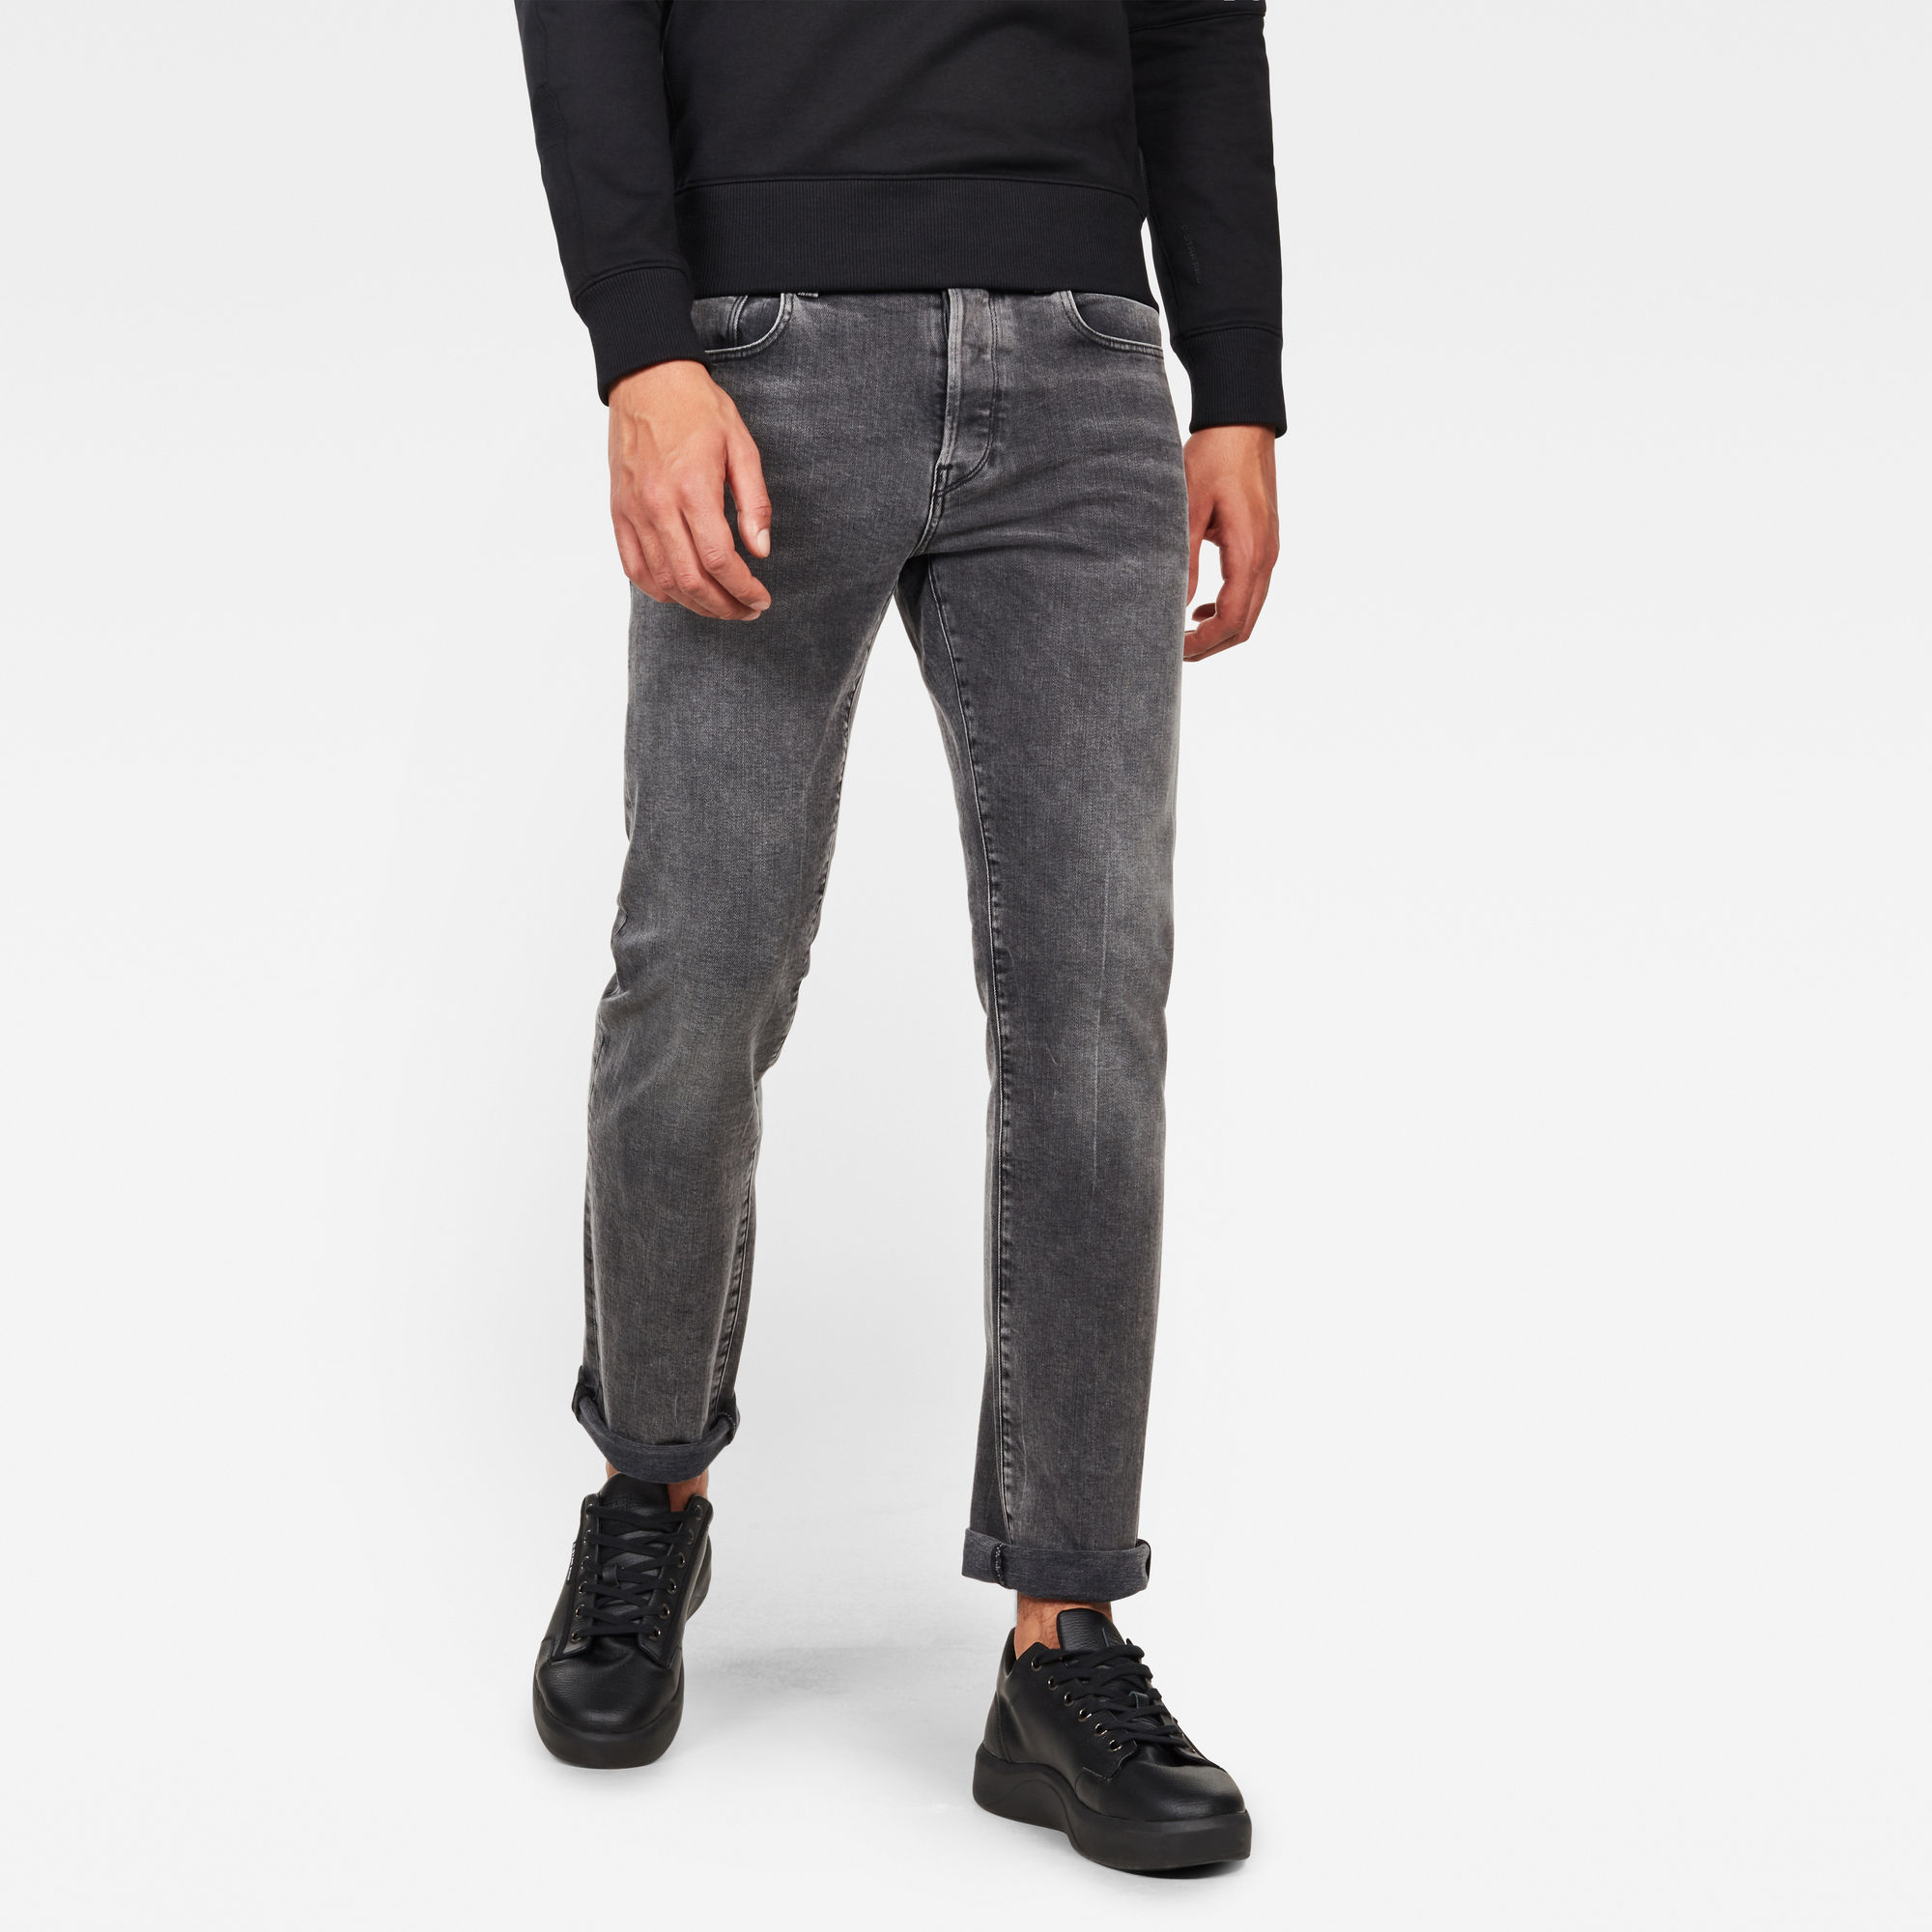 G-Star RAW Heren 3301 Regular Straight Jeans Grijs